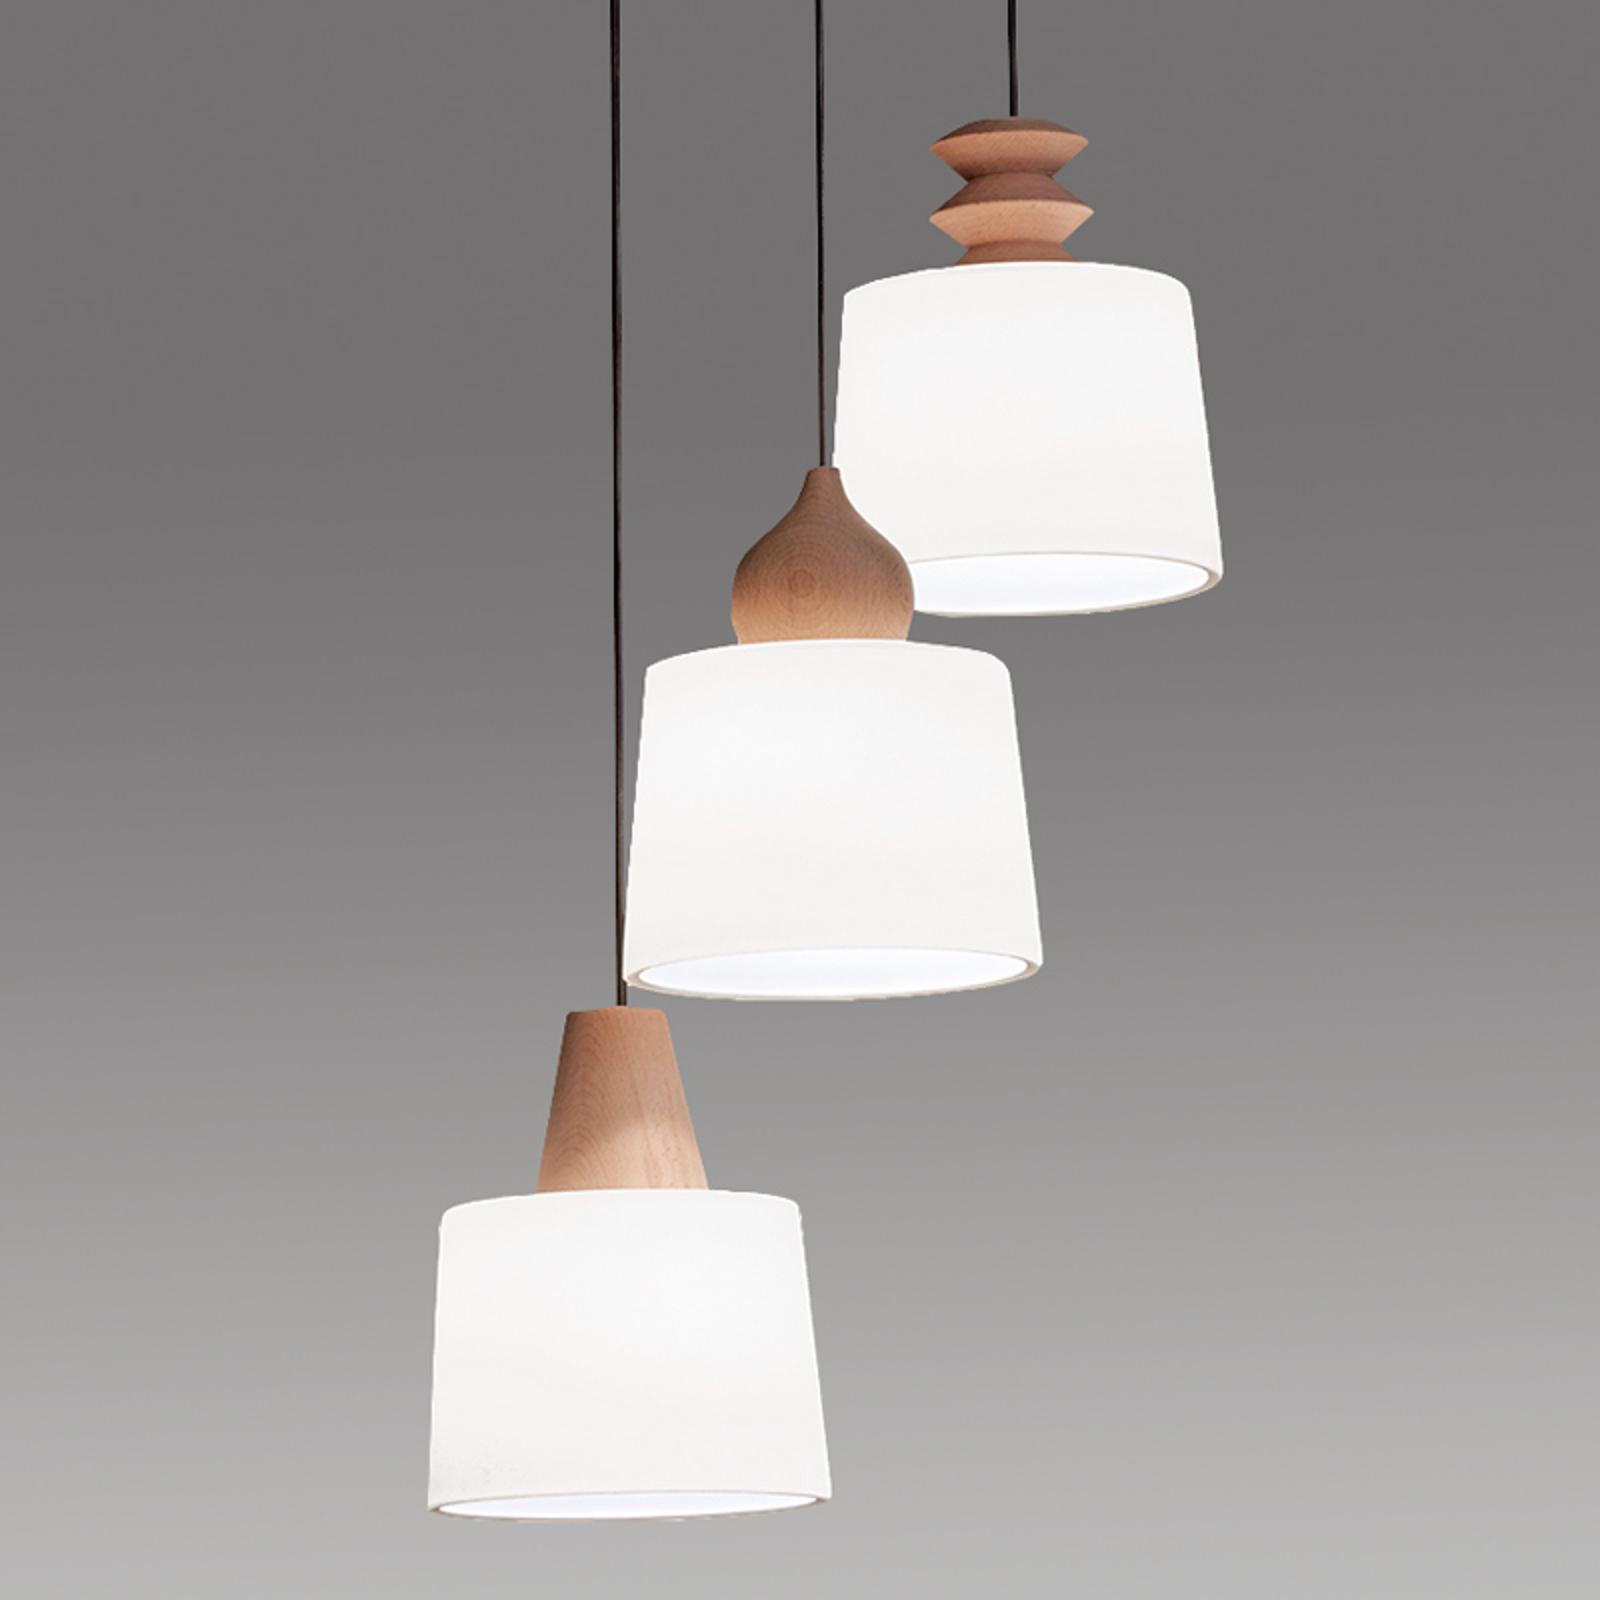 3-lamps hanglamp Eduardo